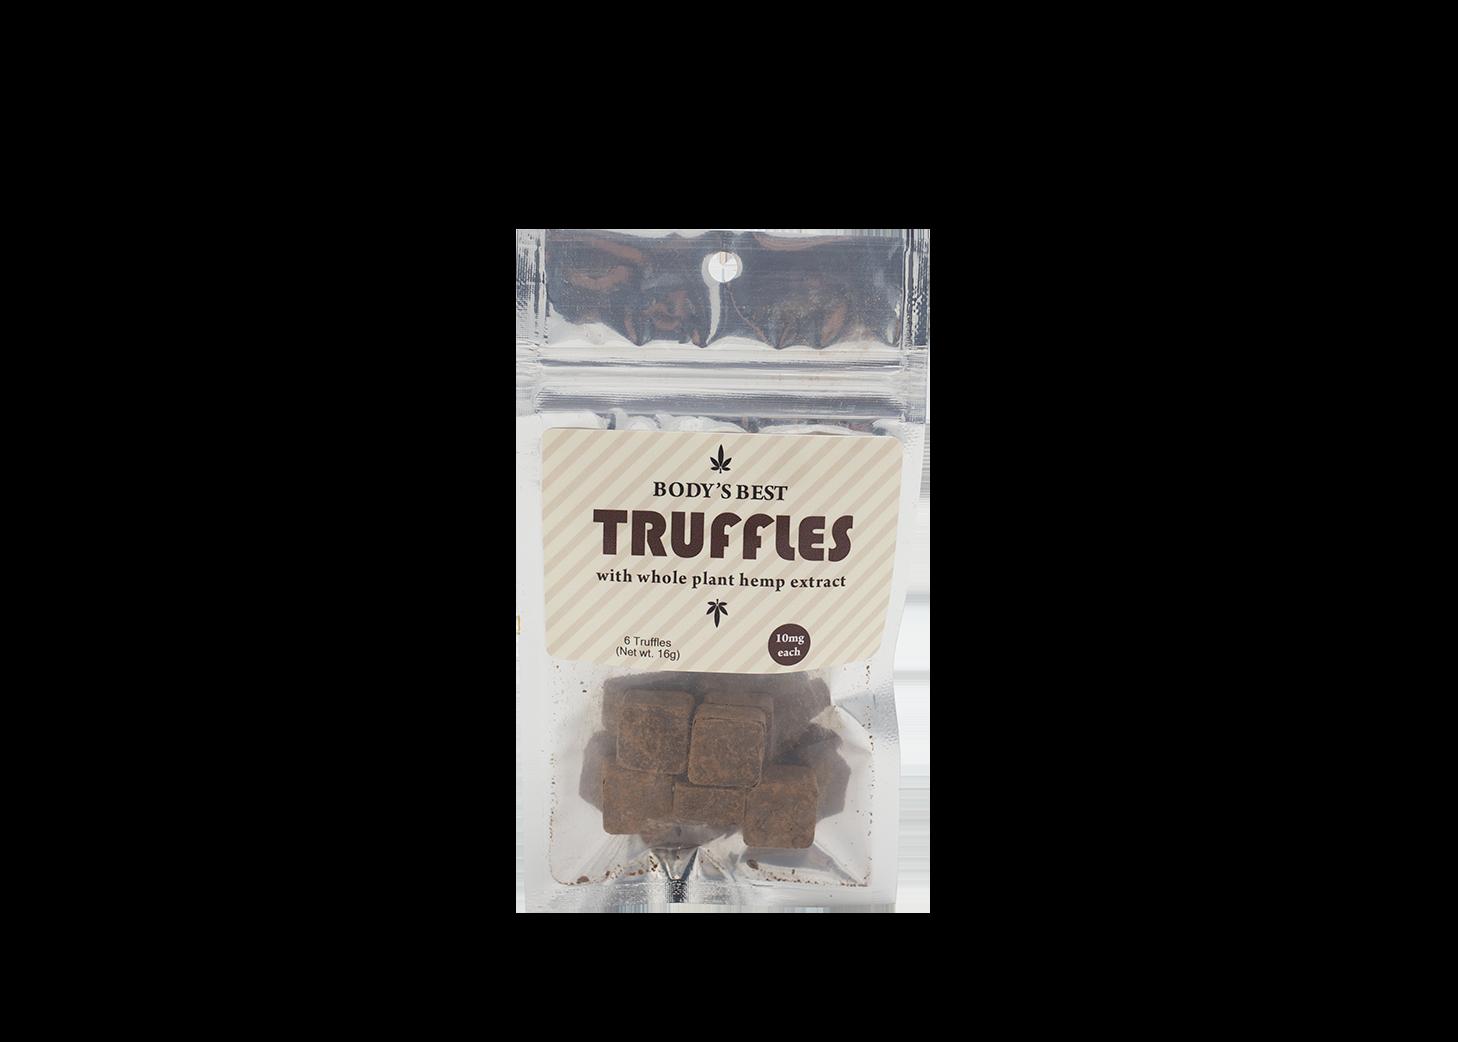 Chocolate Truffles Sampler Pack - 6 pack